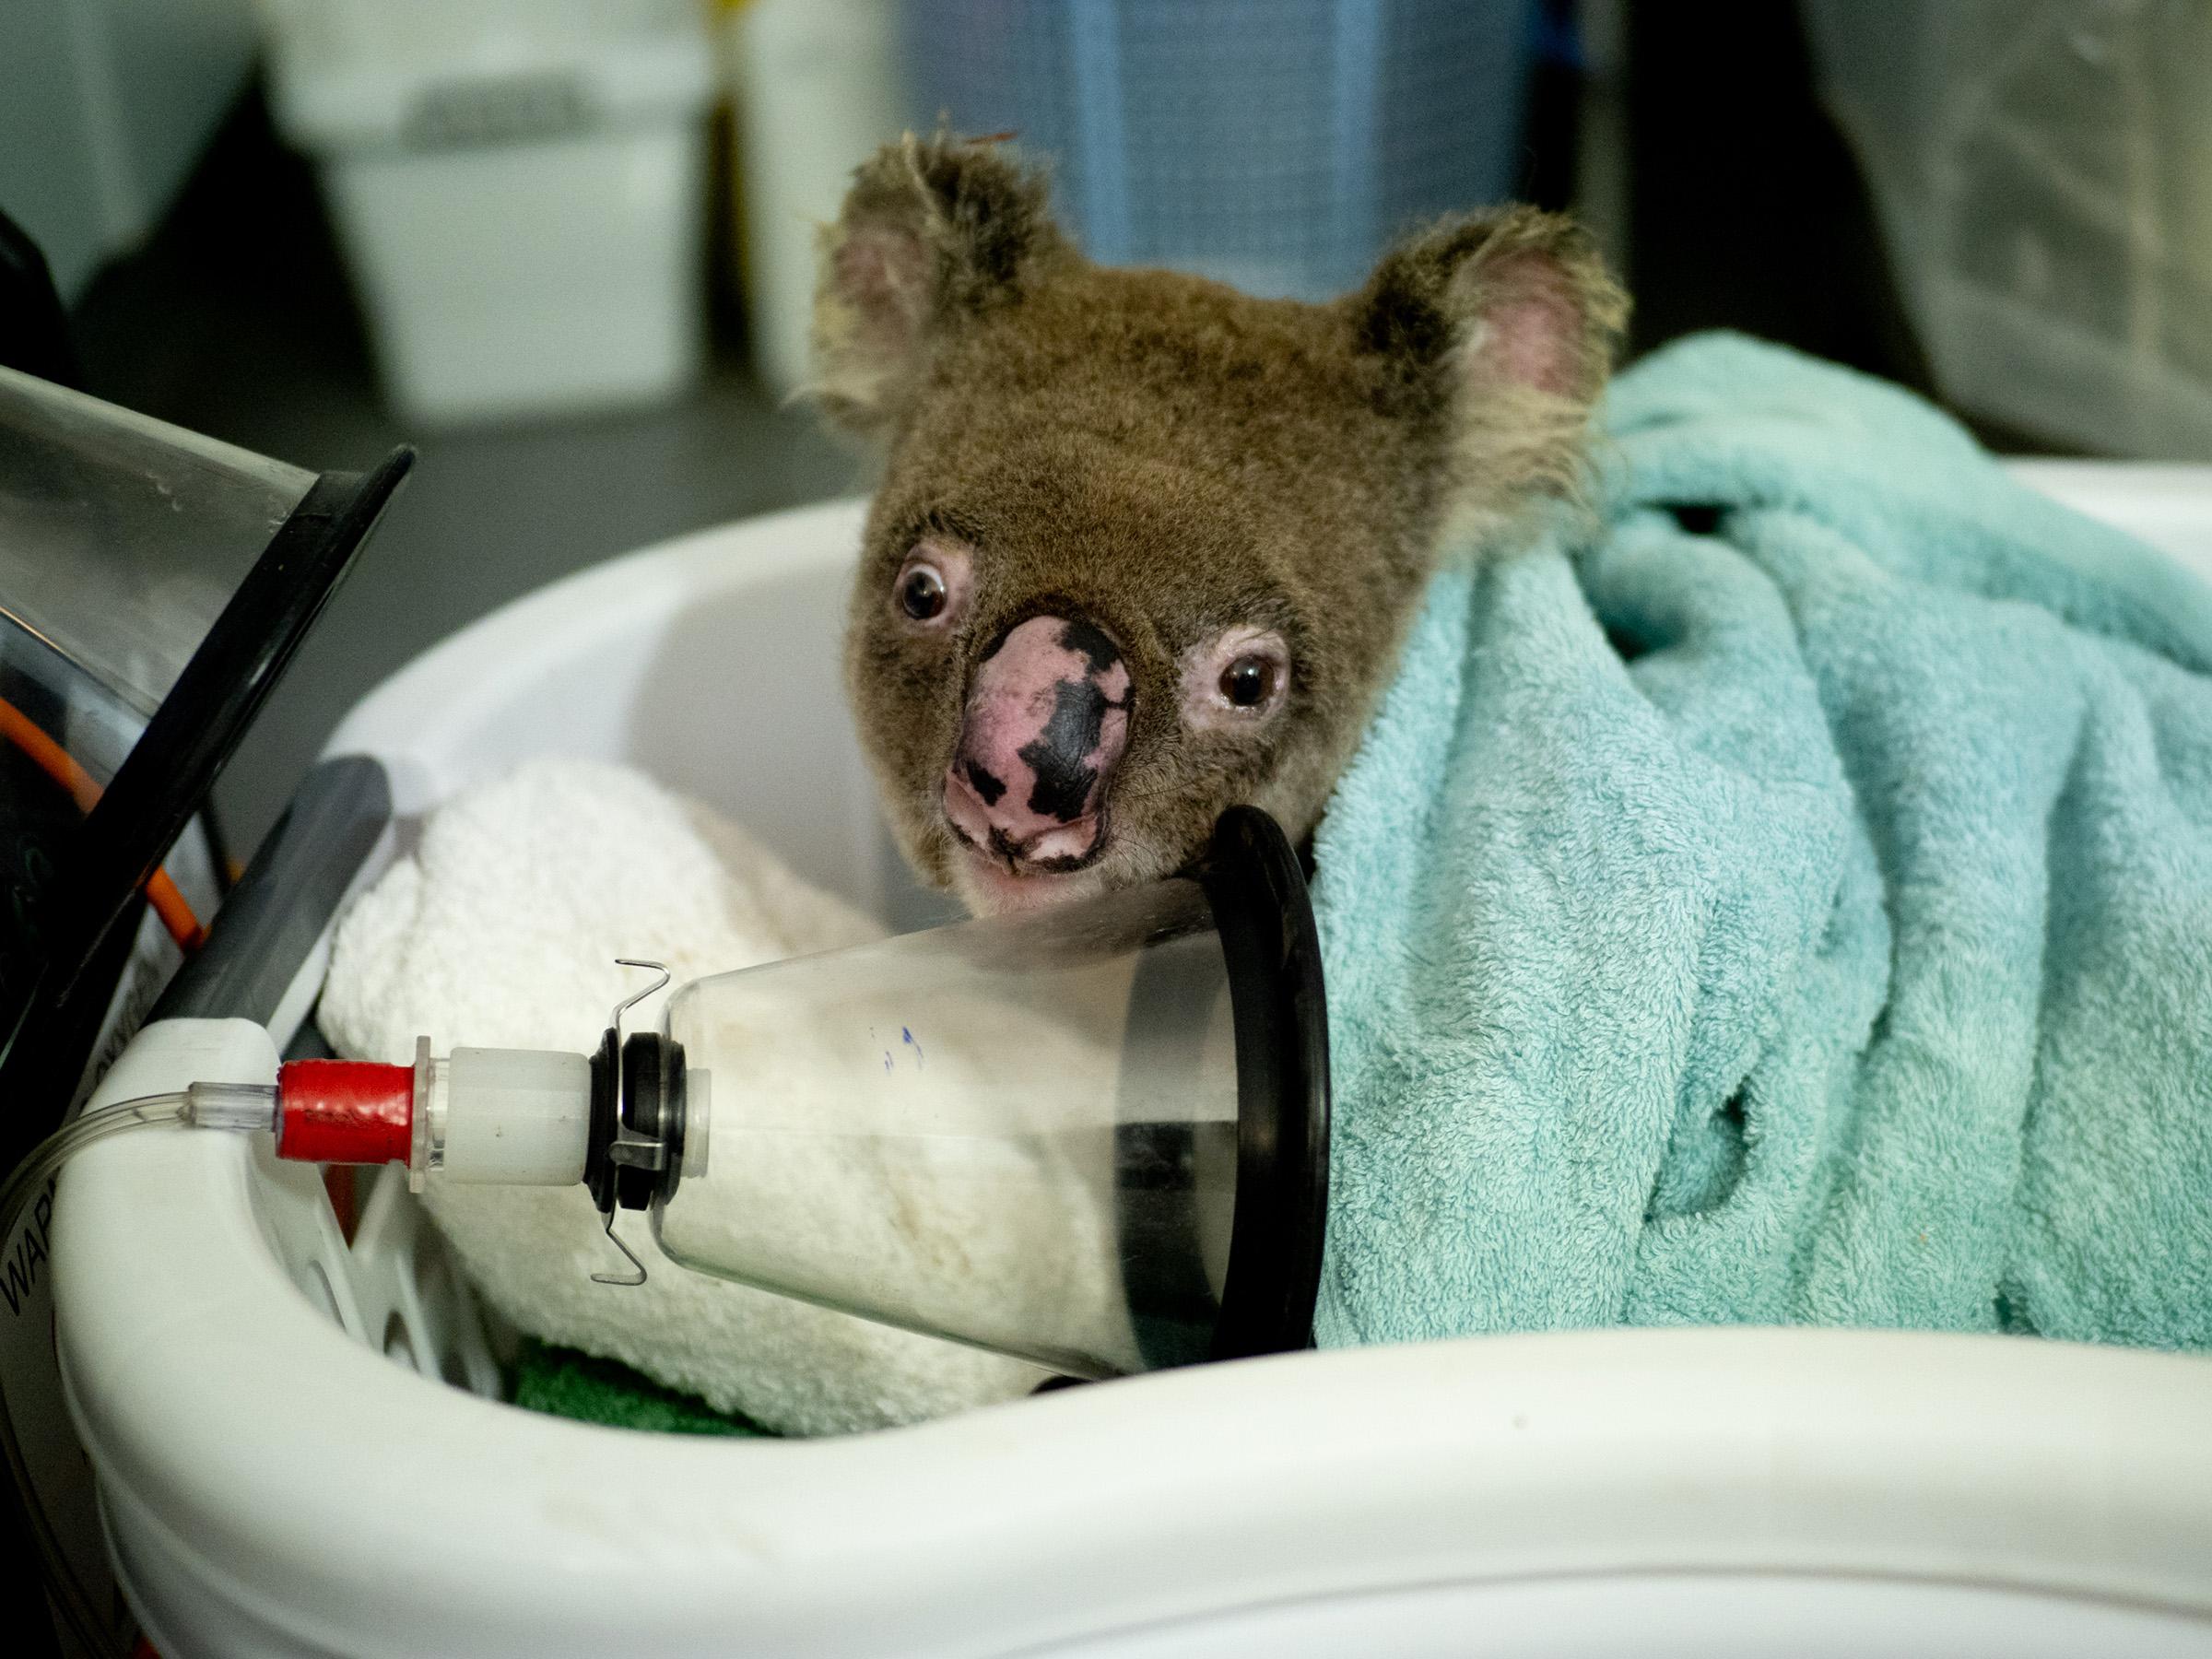 A bushfire survivor wakes up post surgery at Port Macquarie Koala Hospital in Australia on Dec.6, 2019.